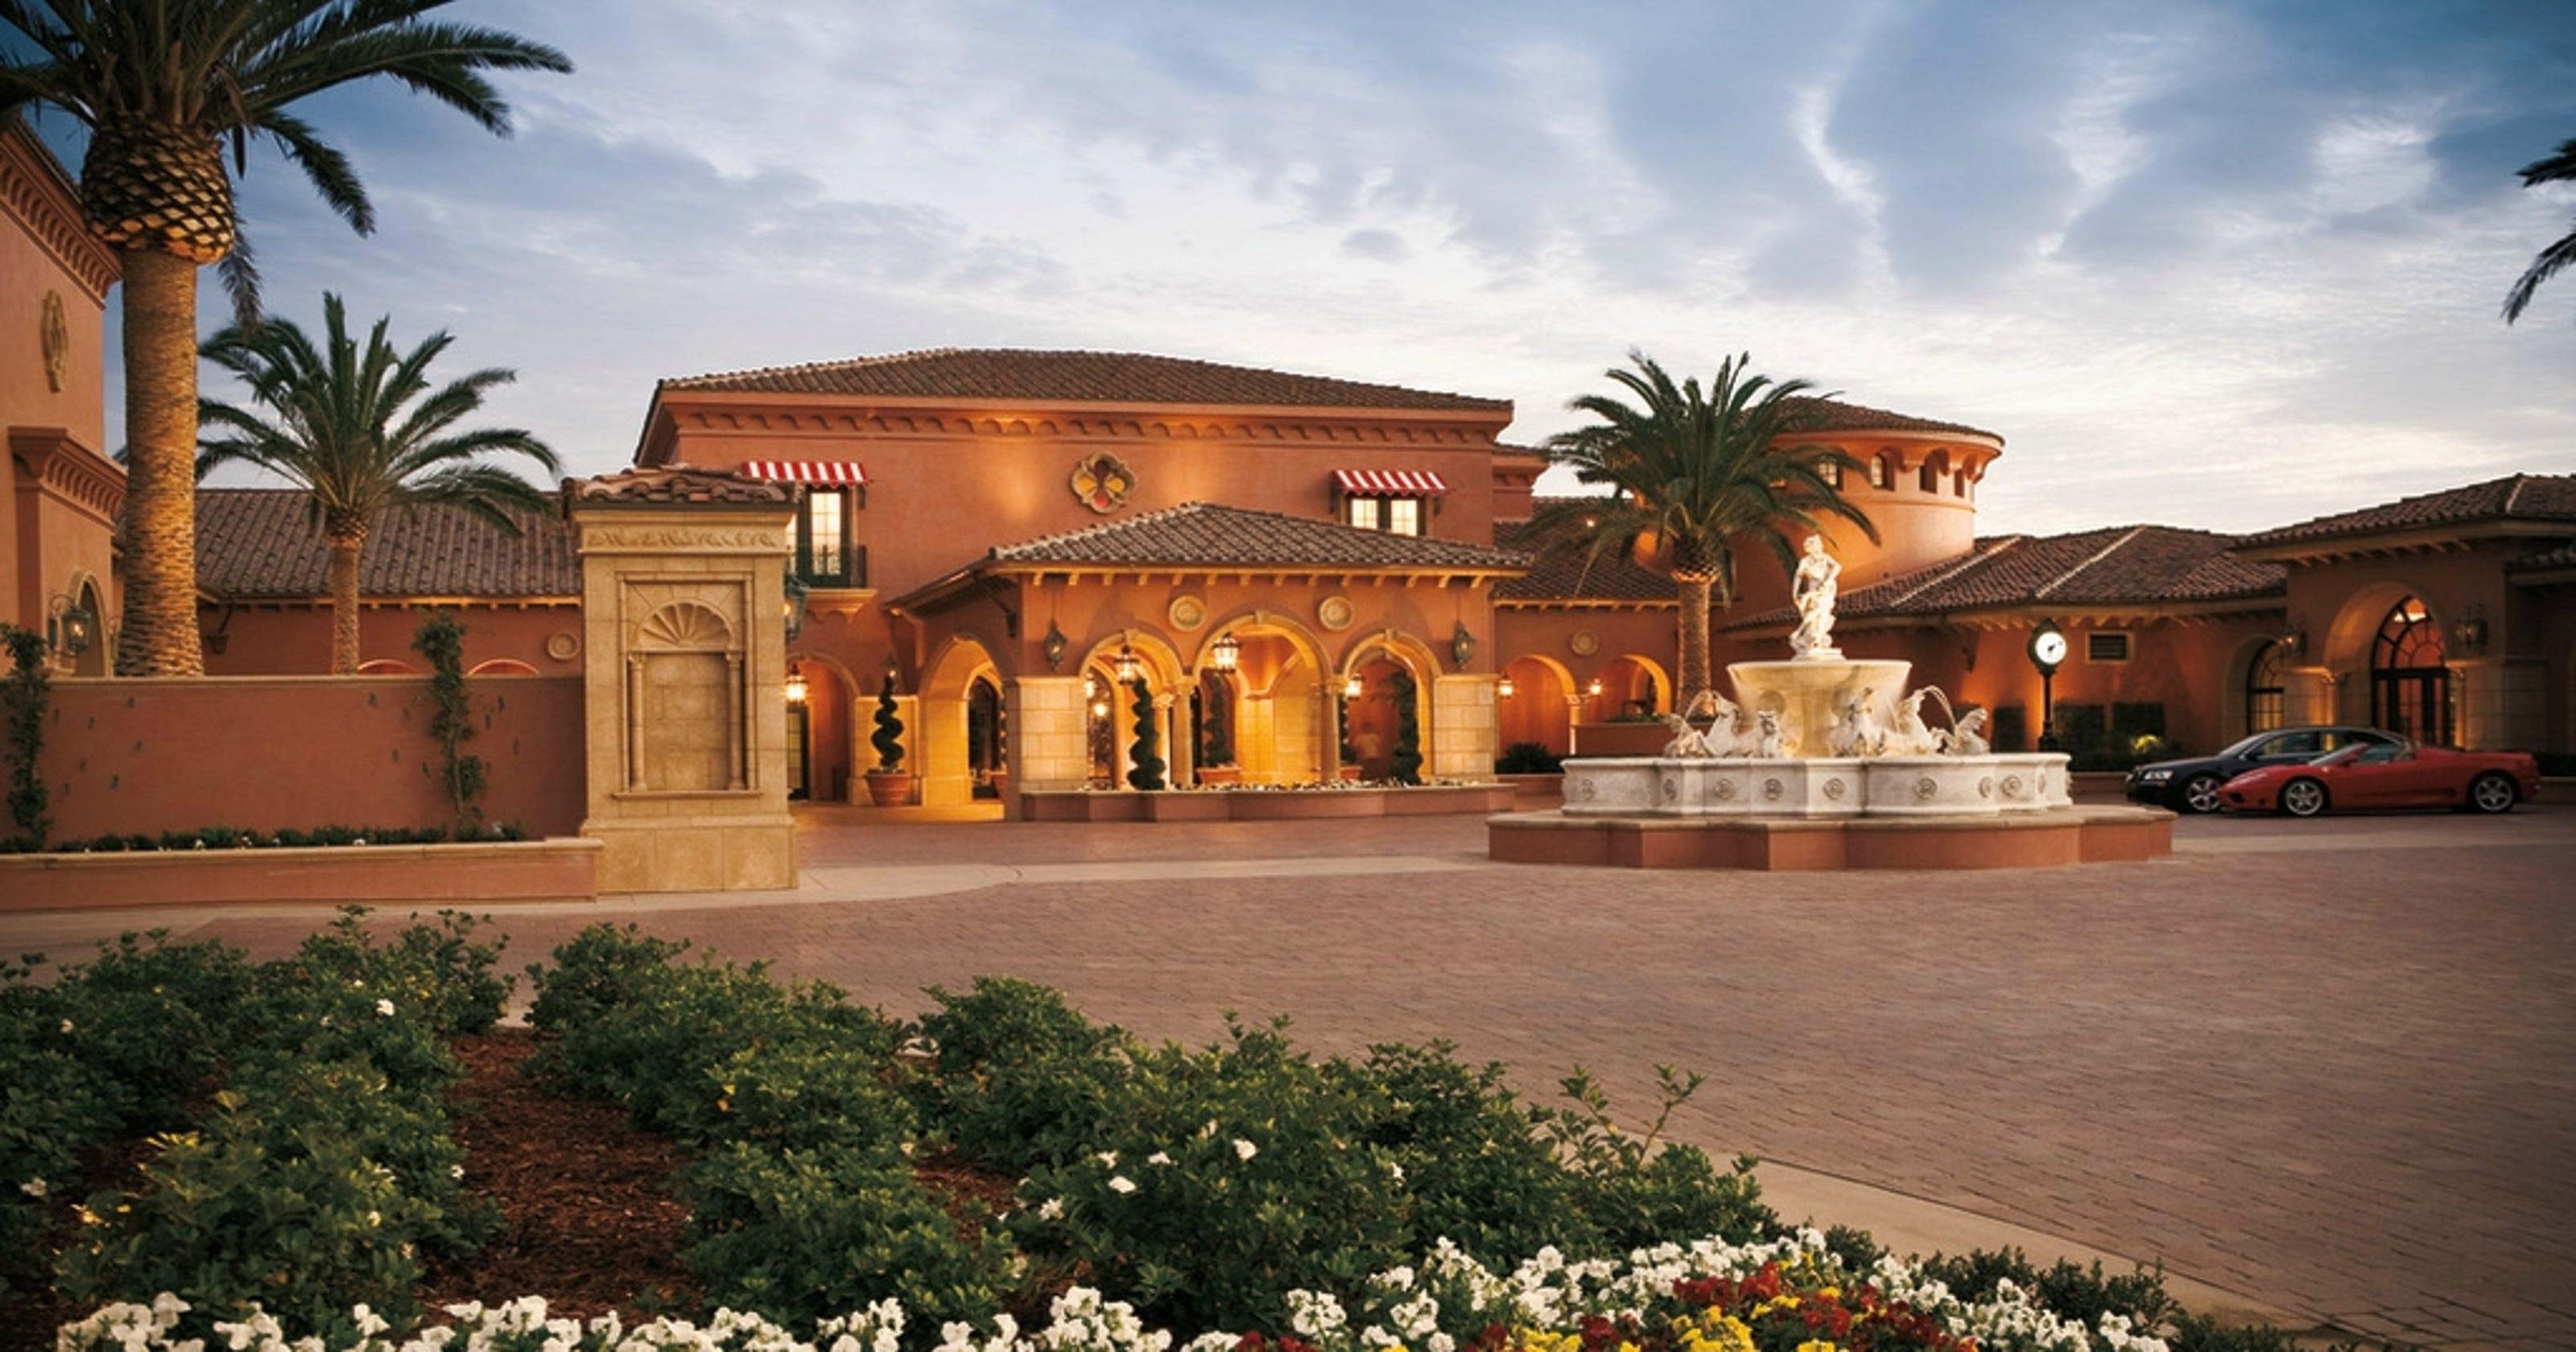 b83bbfcad5 TripAdvisor reviewers name best hotels of 2014